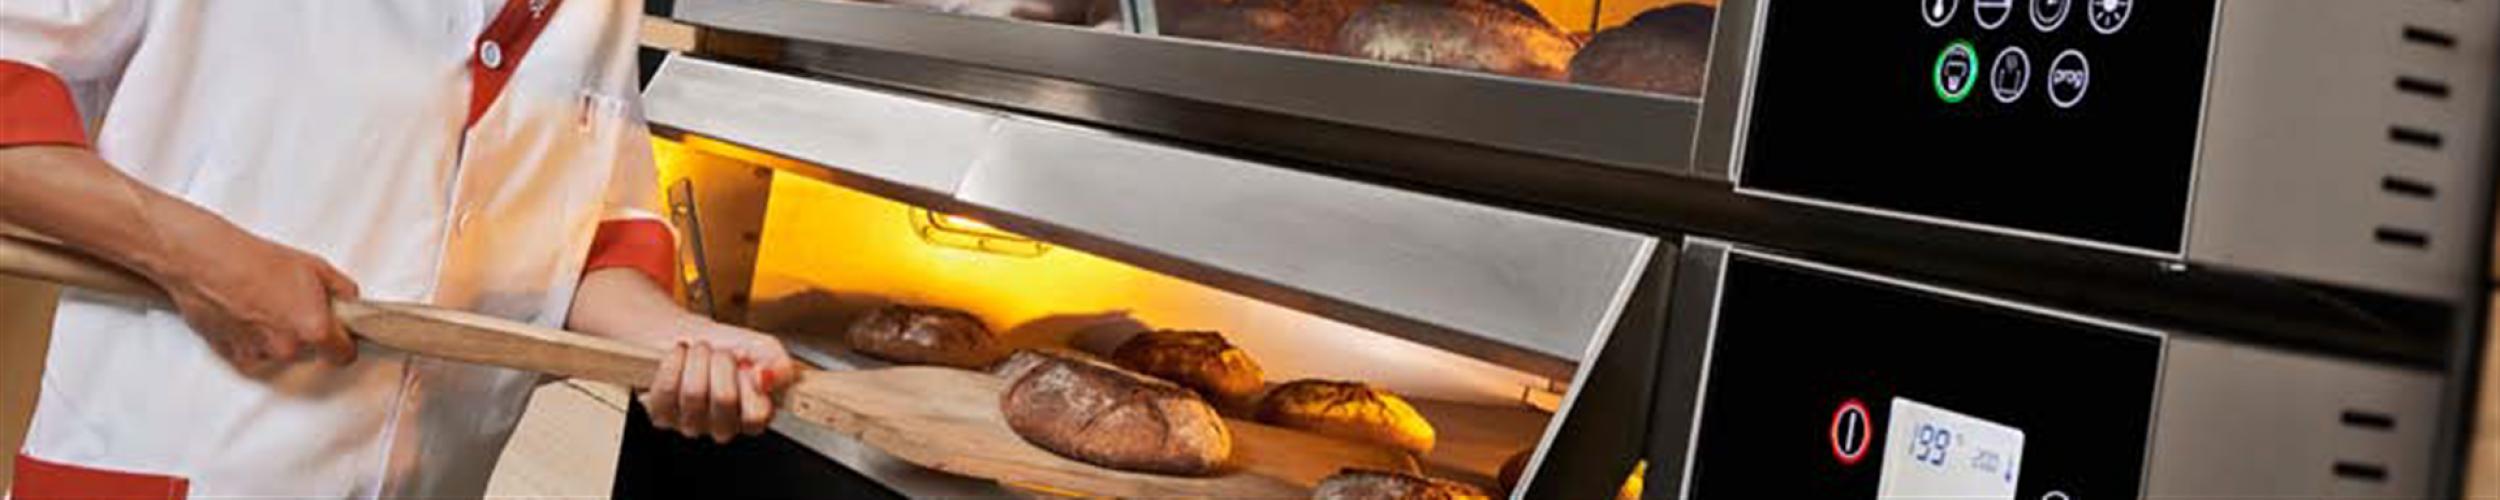 Ovens - SALVA ovens